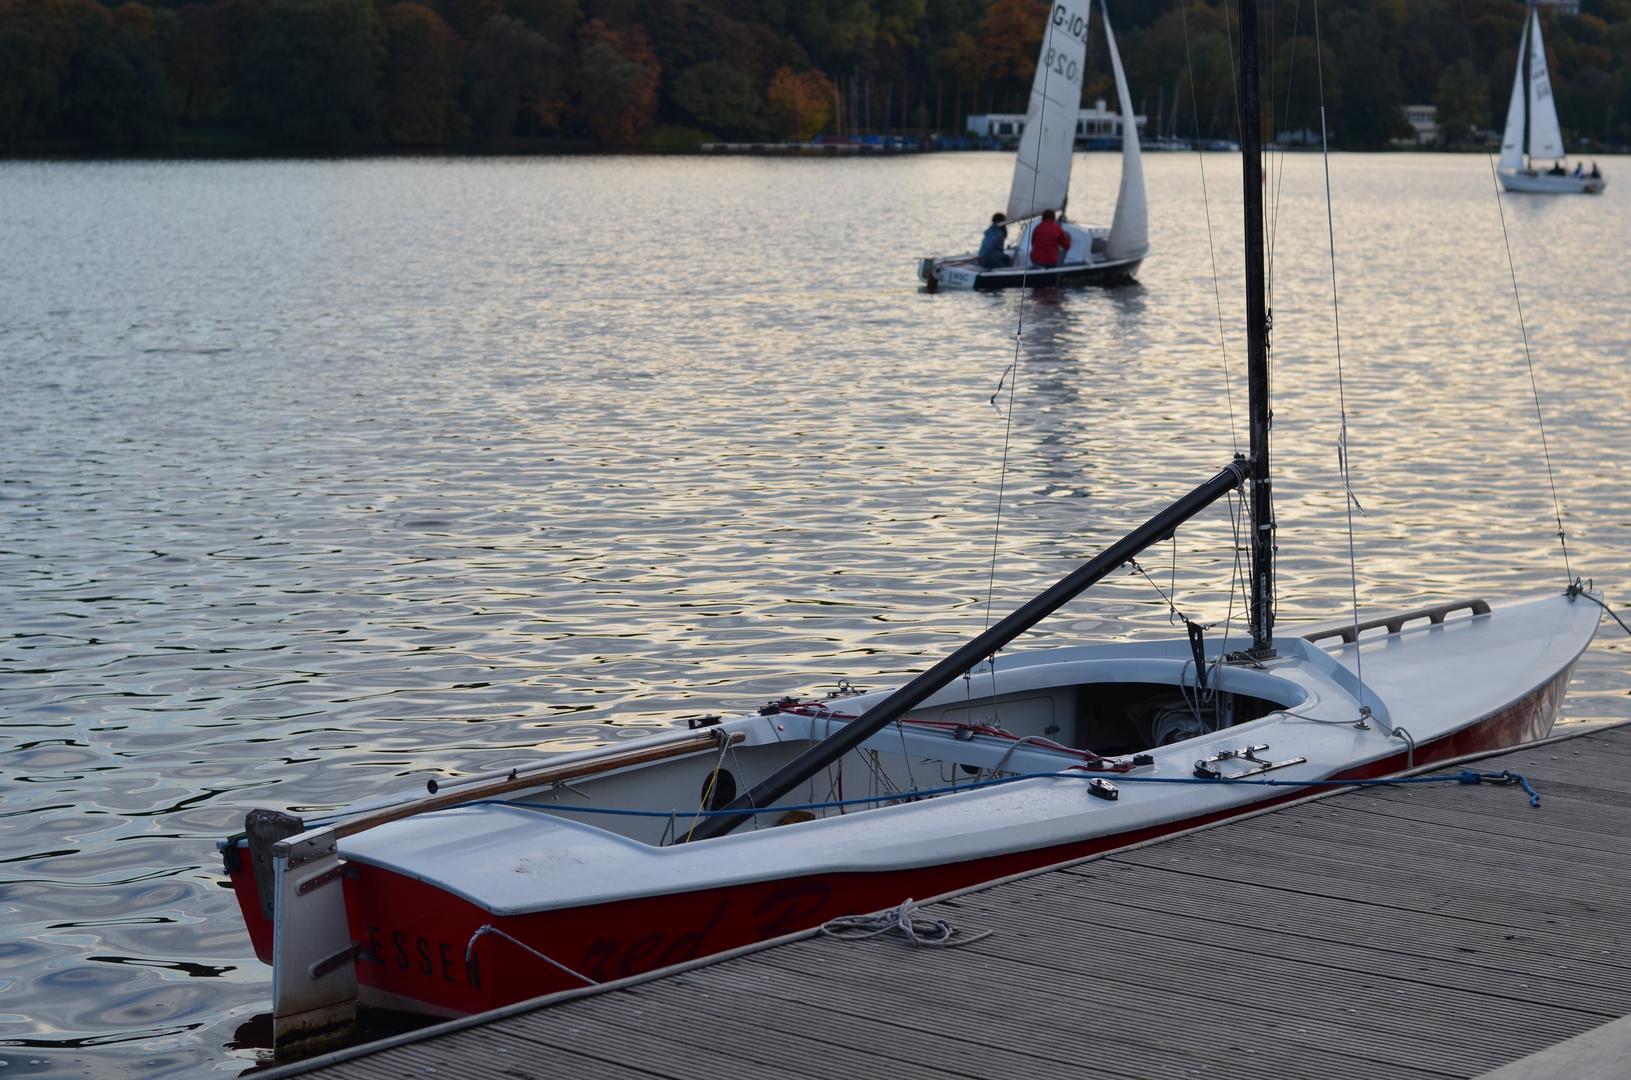 Segelboot am Baldeneysee